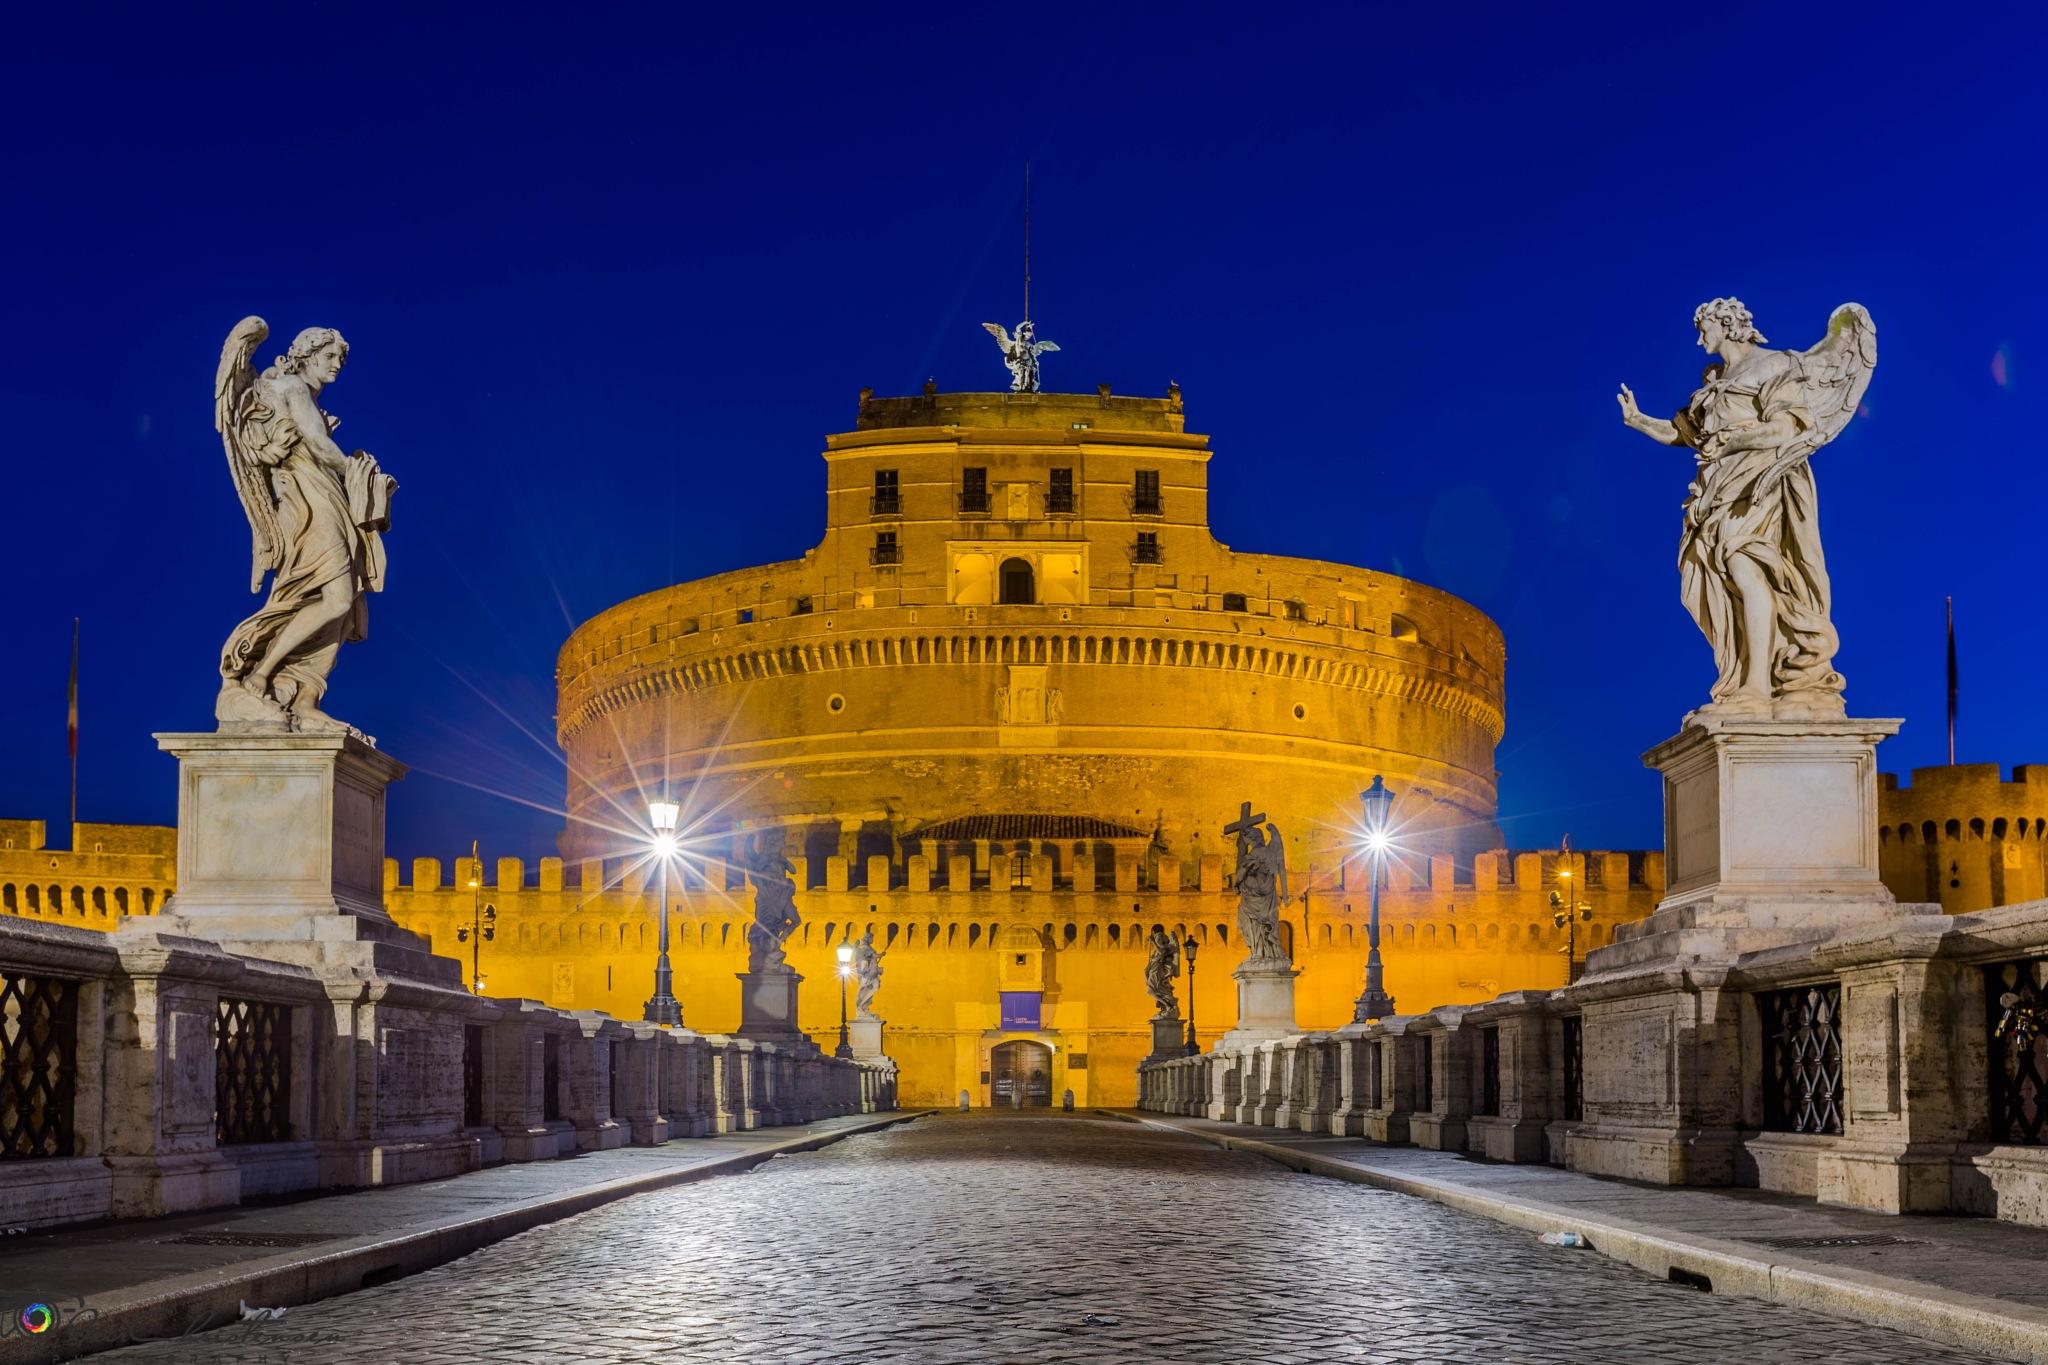 Castel Sant'Angelo by Geir Christensen